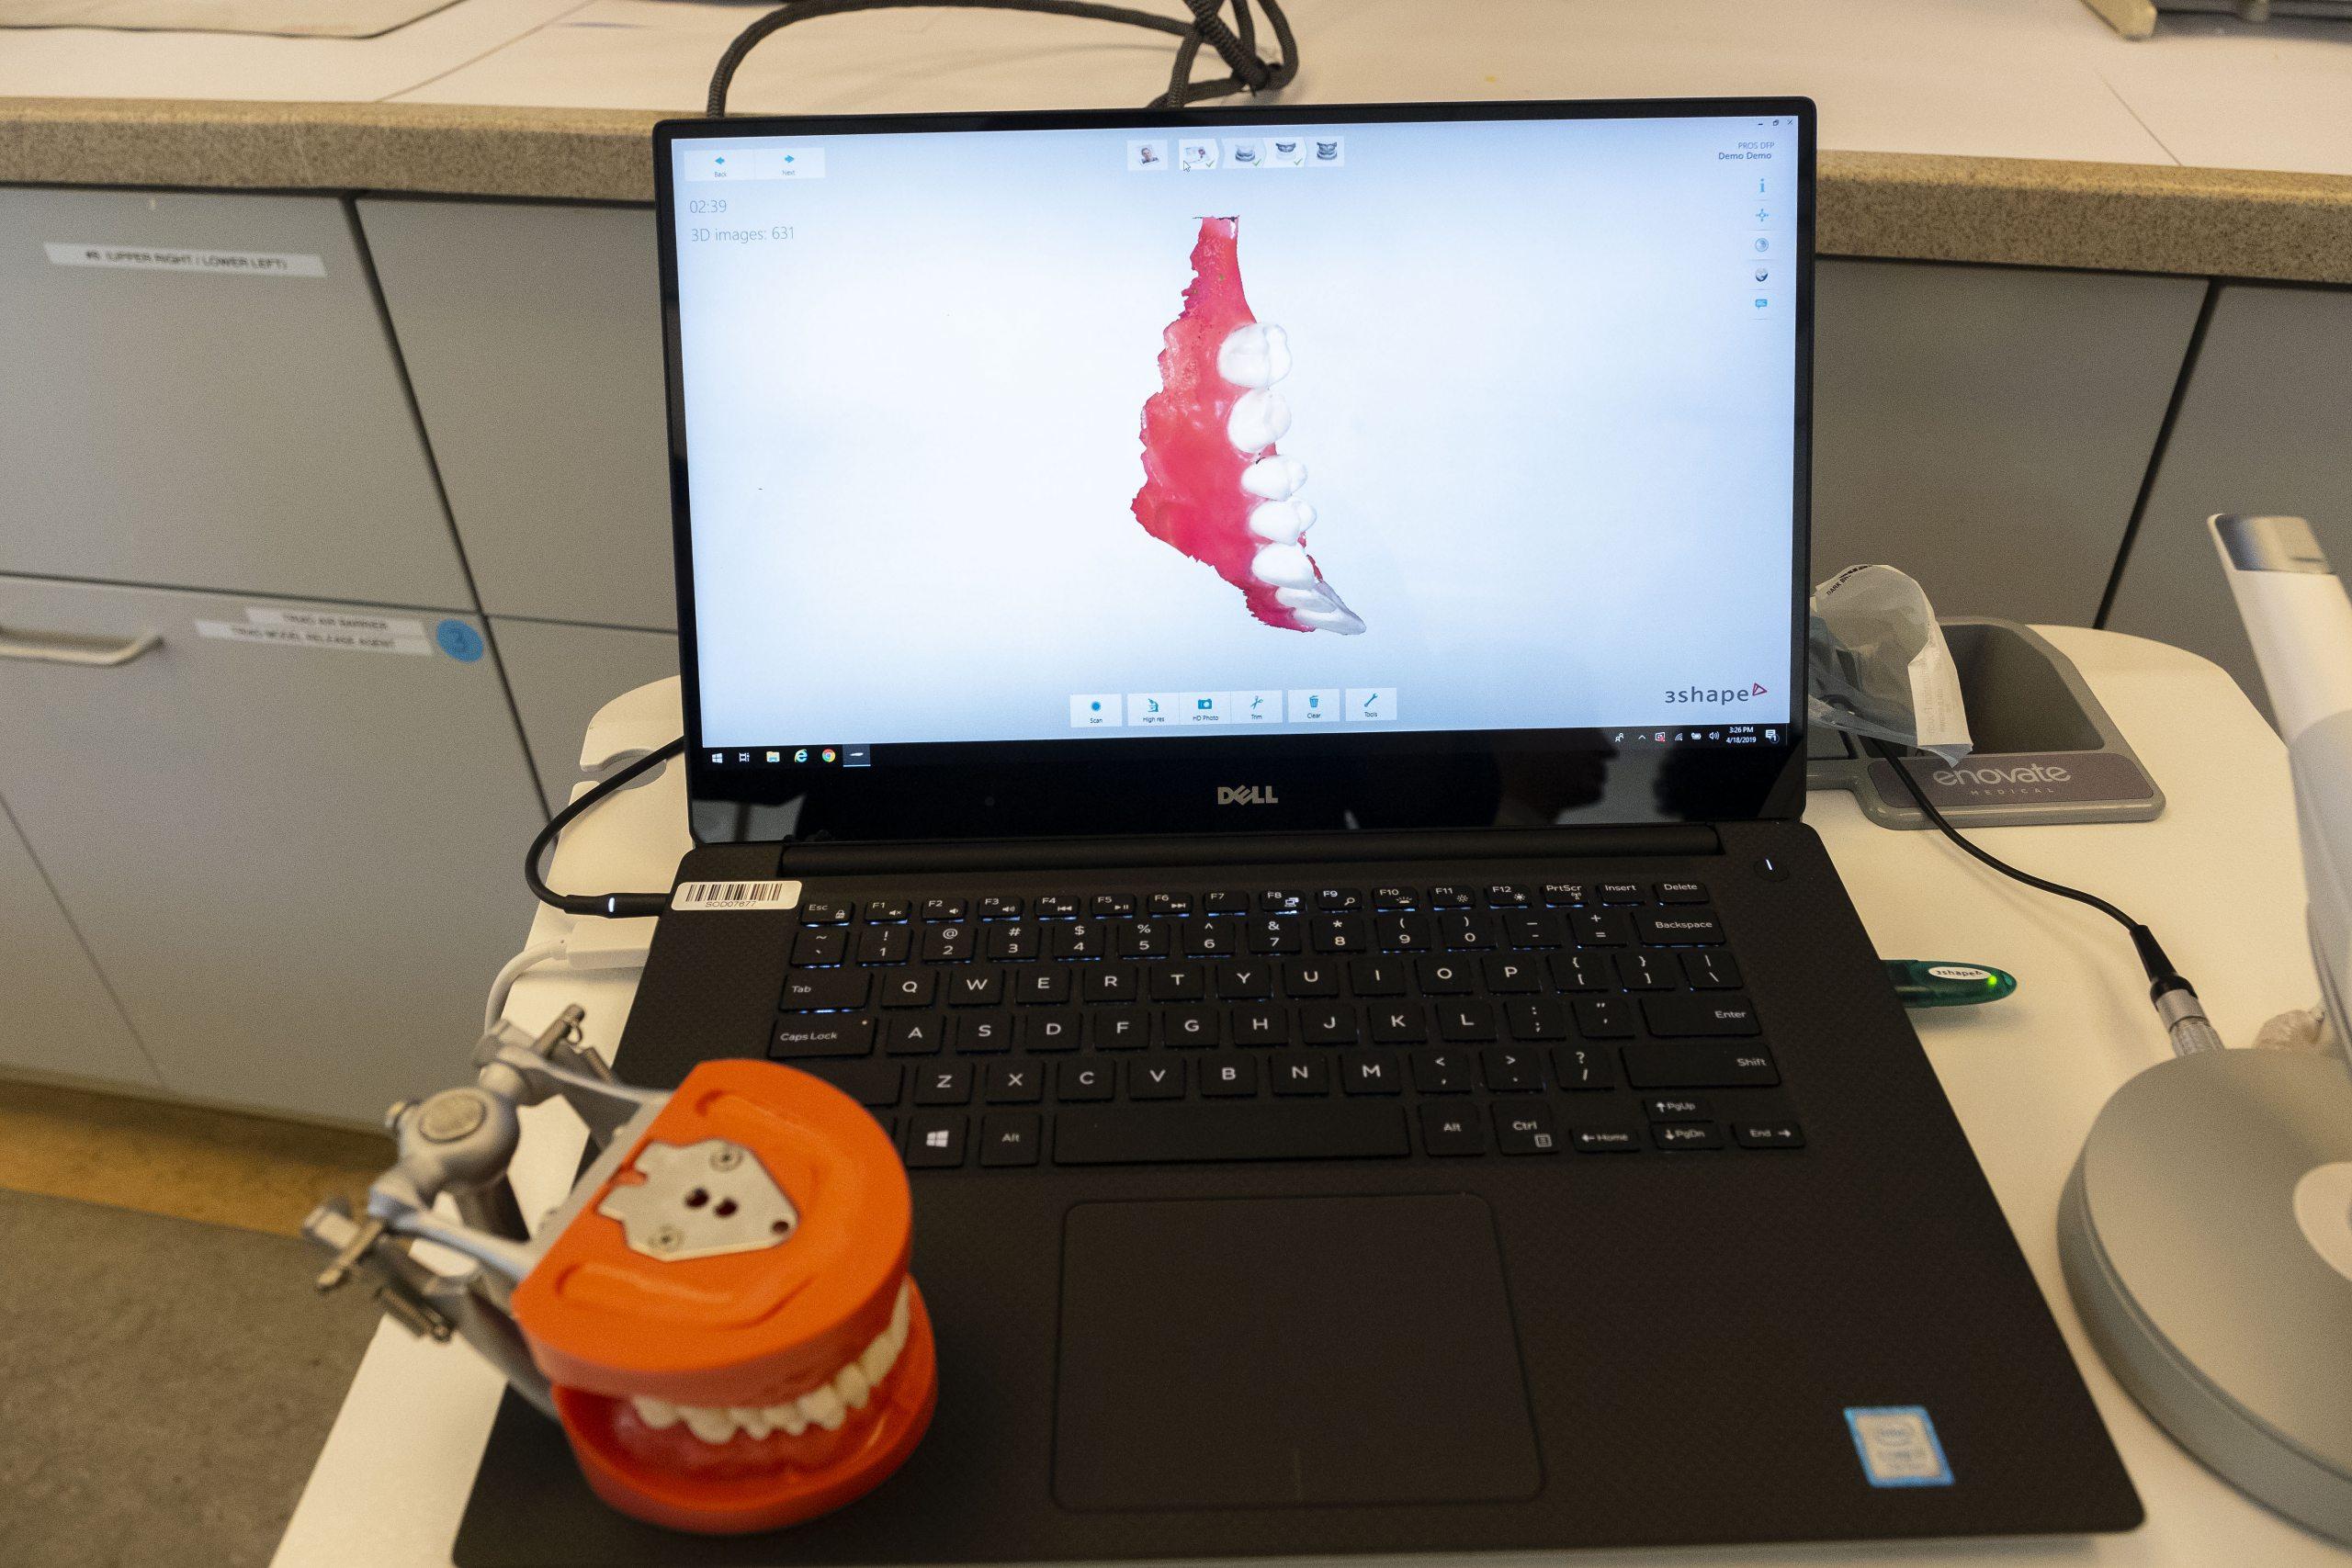 A model of teeth on a laptop.